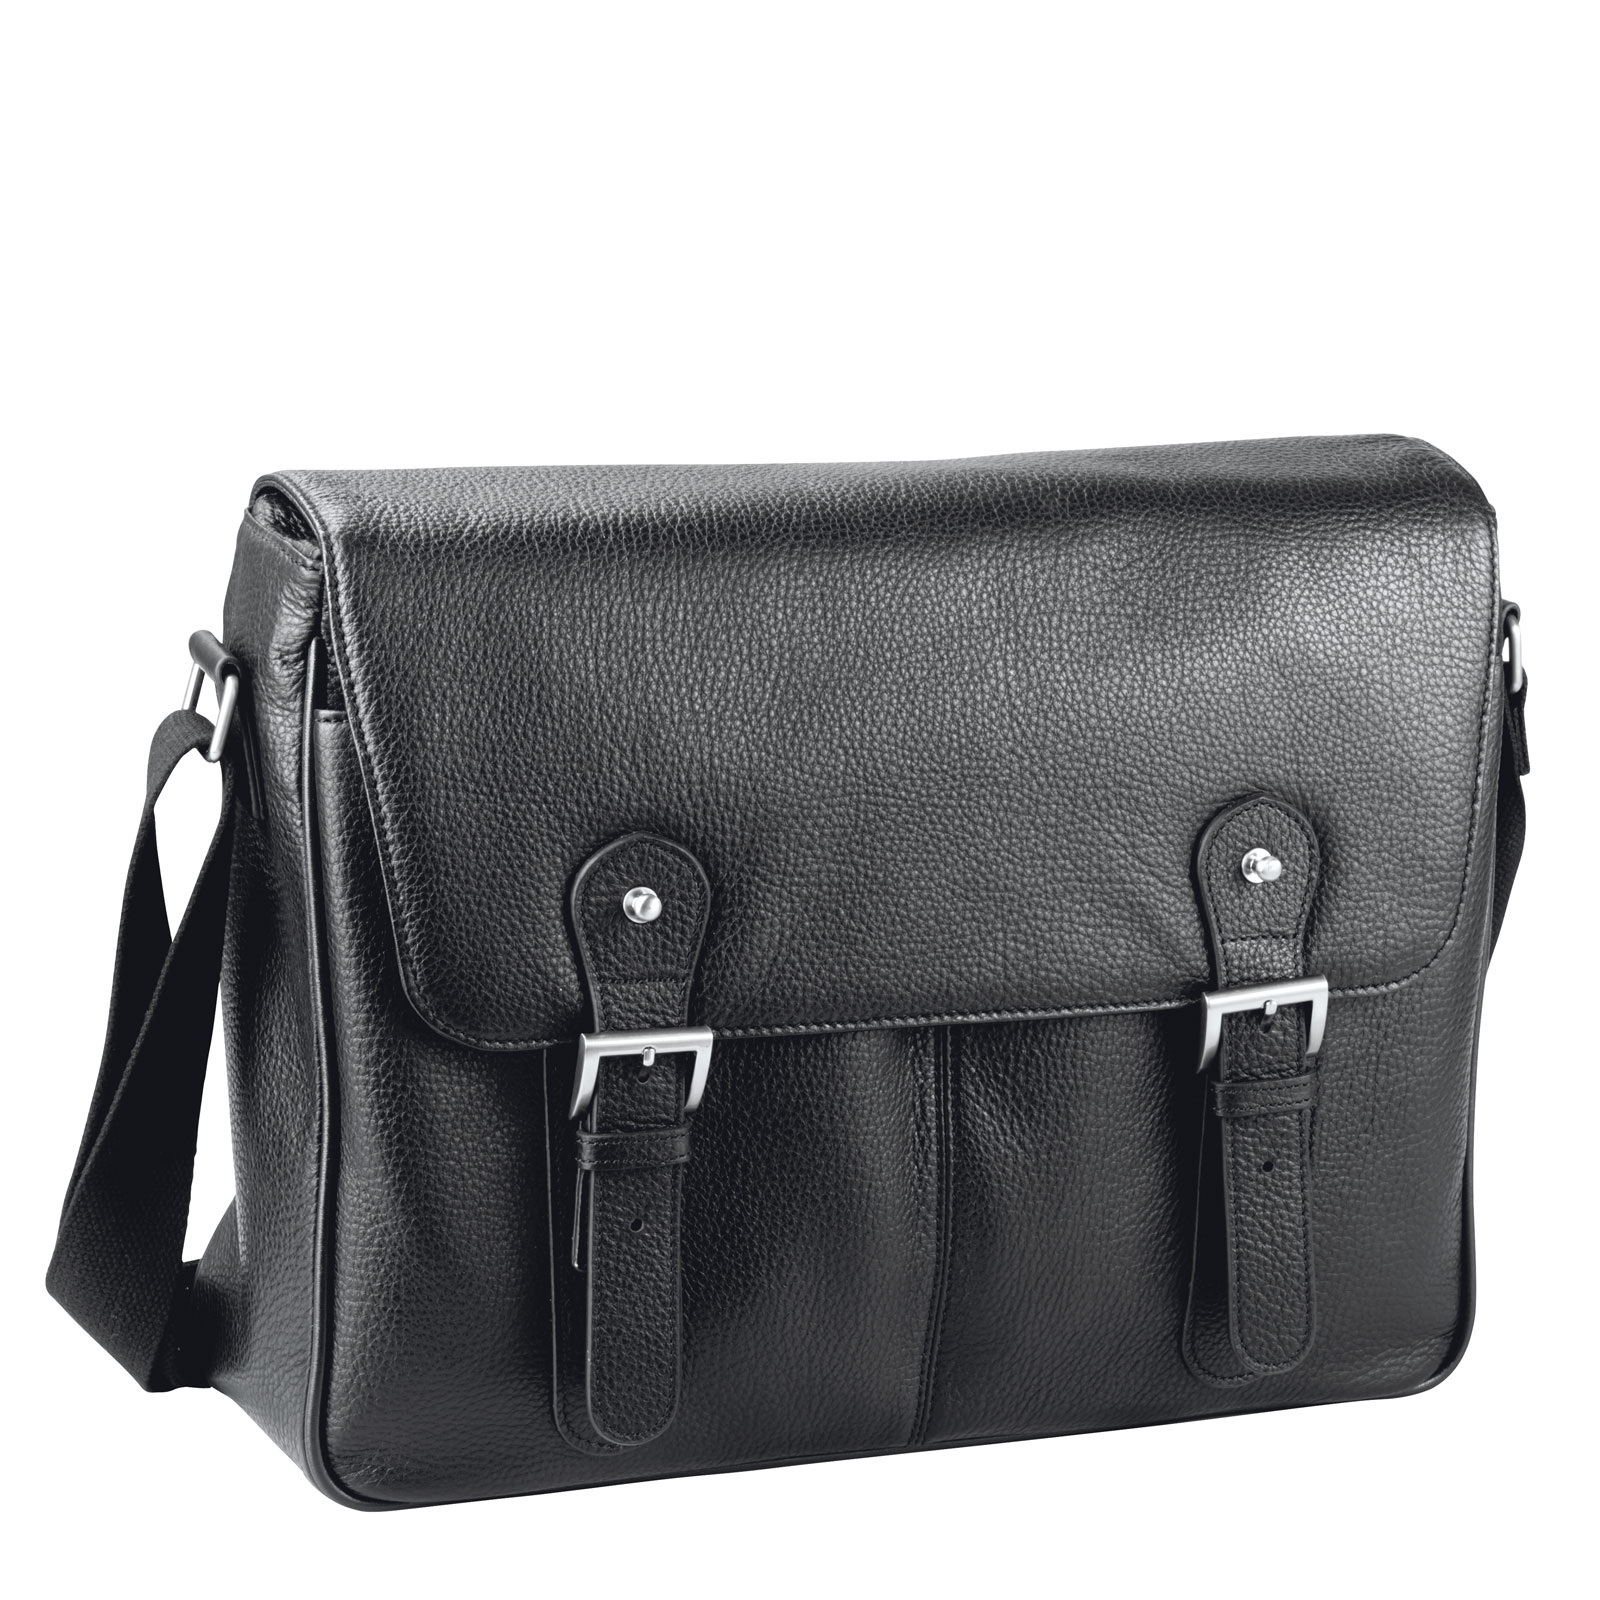 7e54f91c1147b d n Business Line Messenger Bag 40 cm günstig kaufen